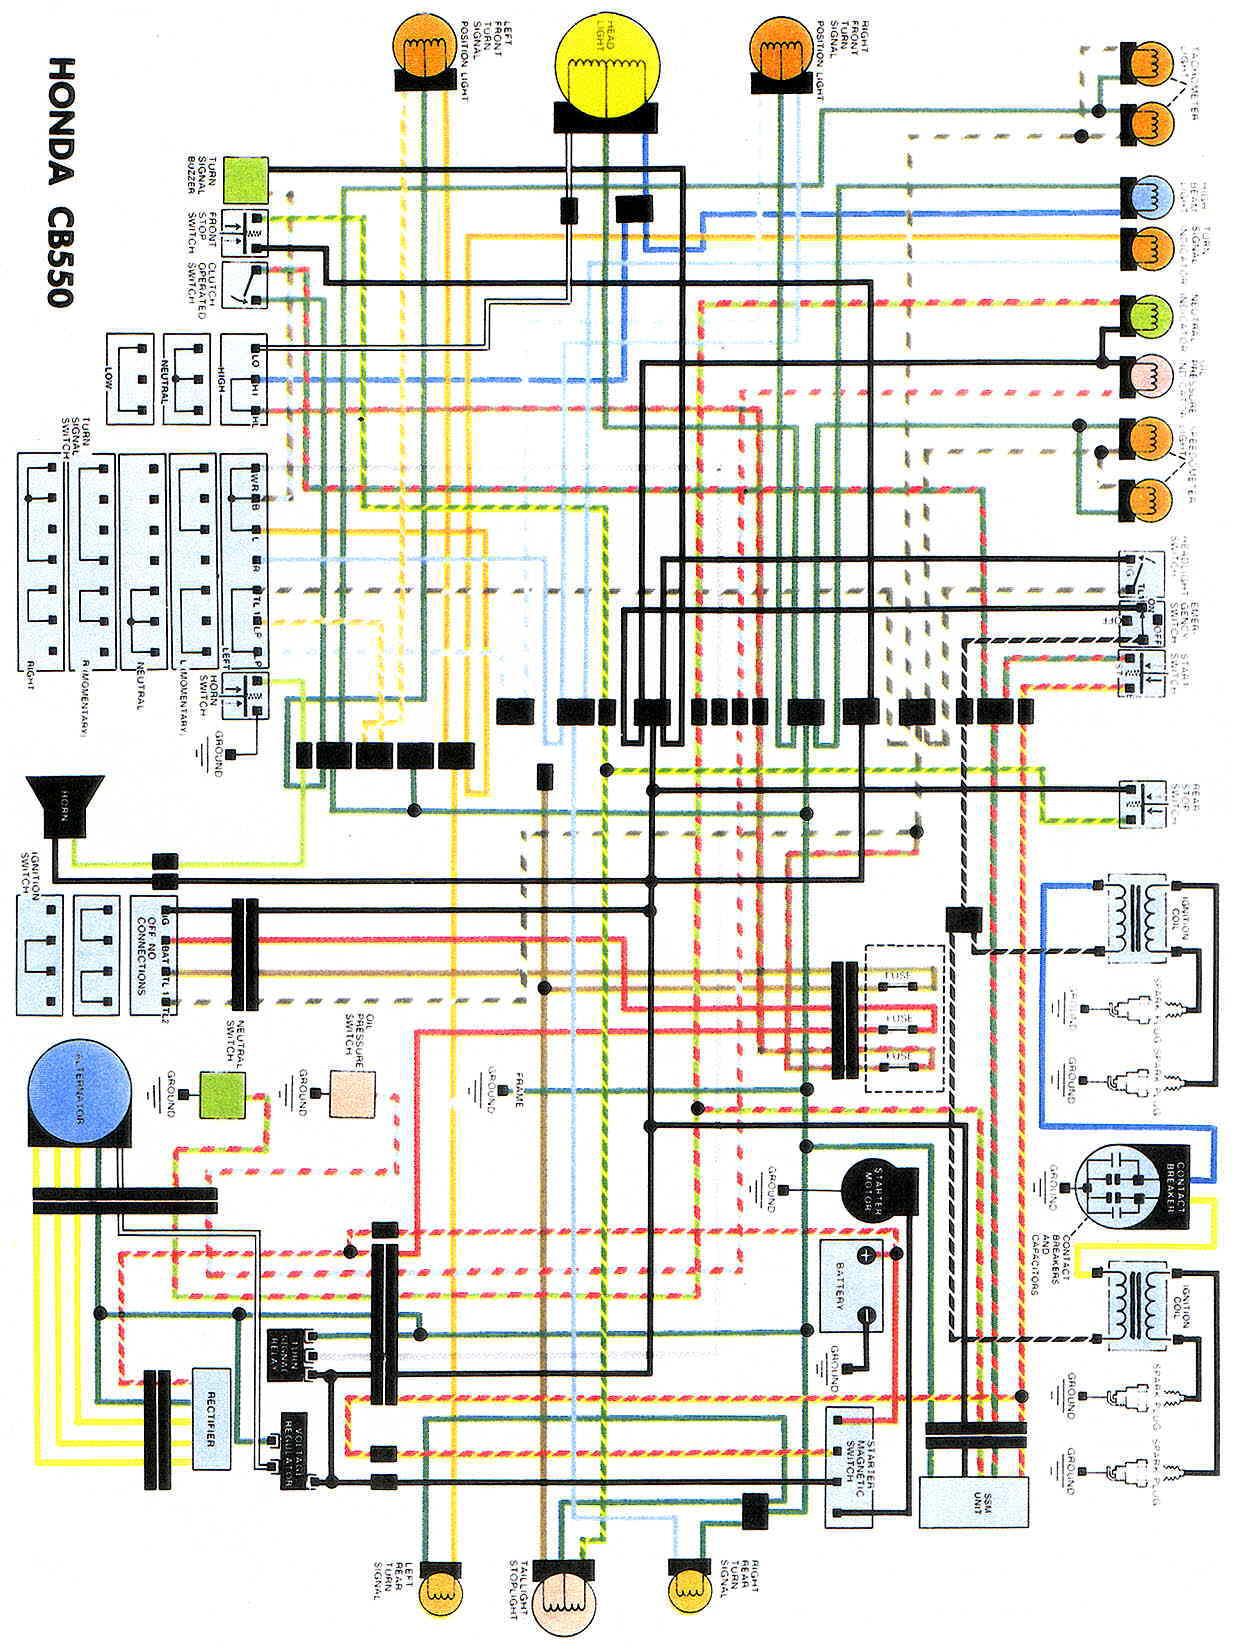 Admirable Honda Cm400 Wiring A Motorcycle Basic Electronics Wiring Diagram Wiring Cloud Peadfoxcilixyz